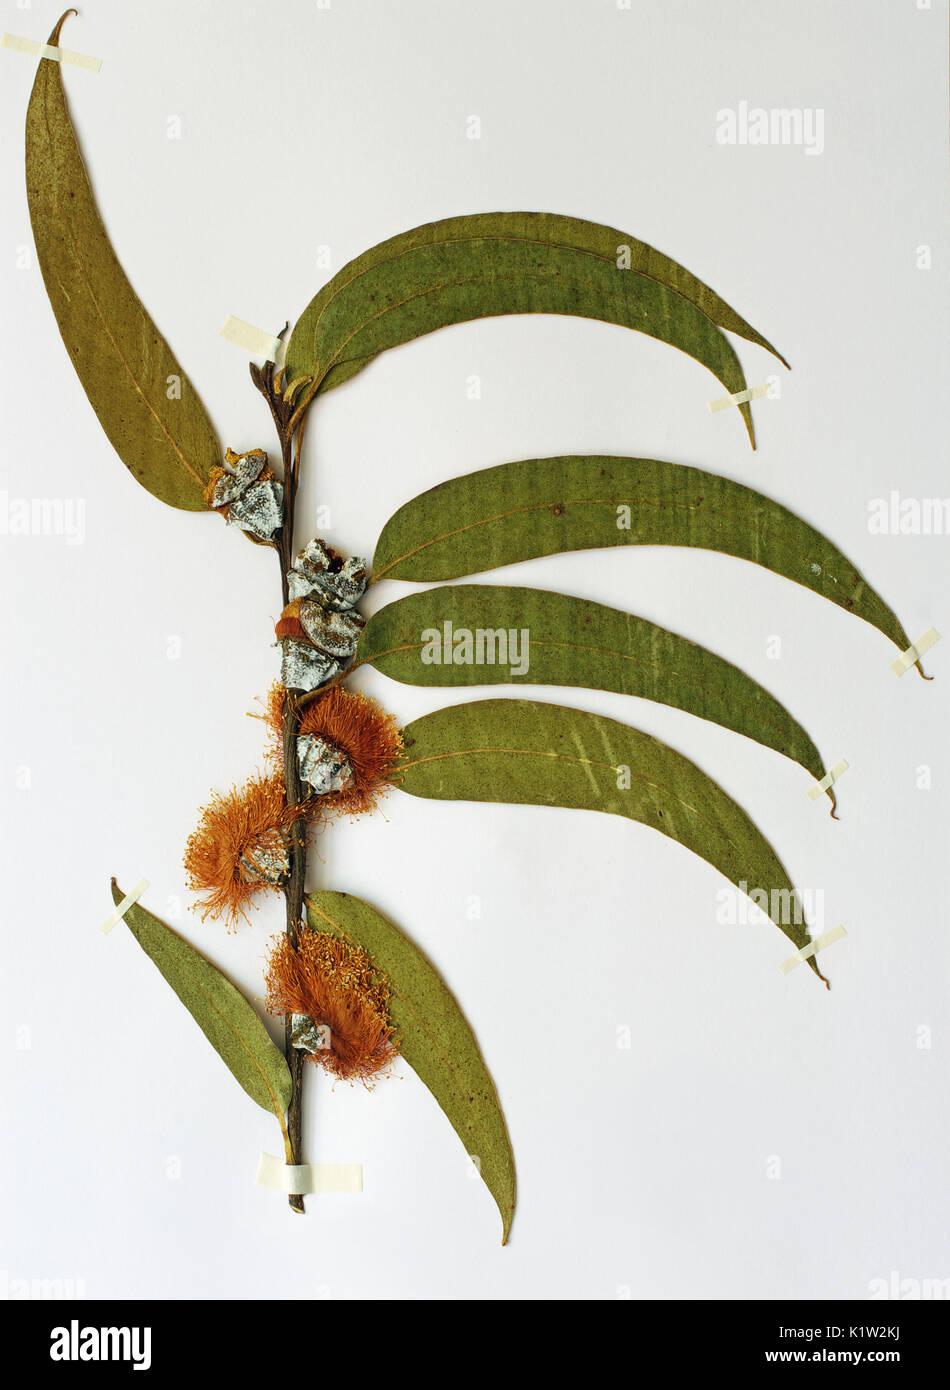 A herbarium sheet with Eucalyptus globulus, the Tasmanian bluegum or Southern blue gum, family Myrtaceae, native to Australia - Stock Image